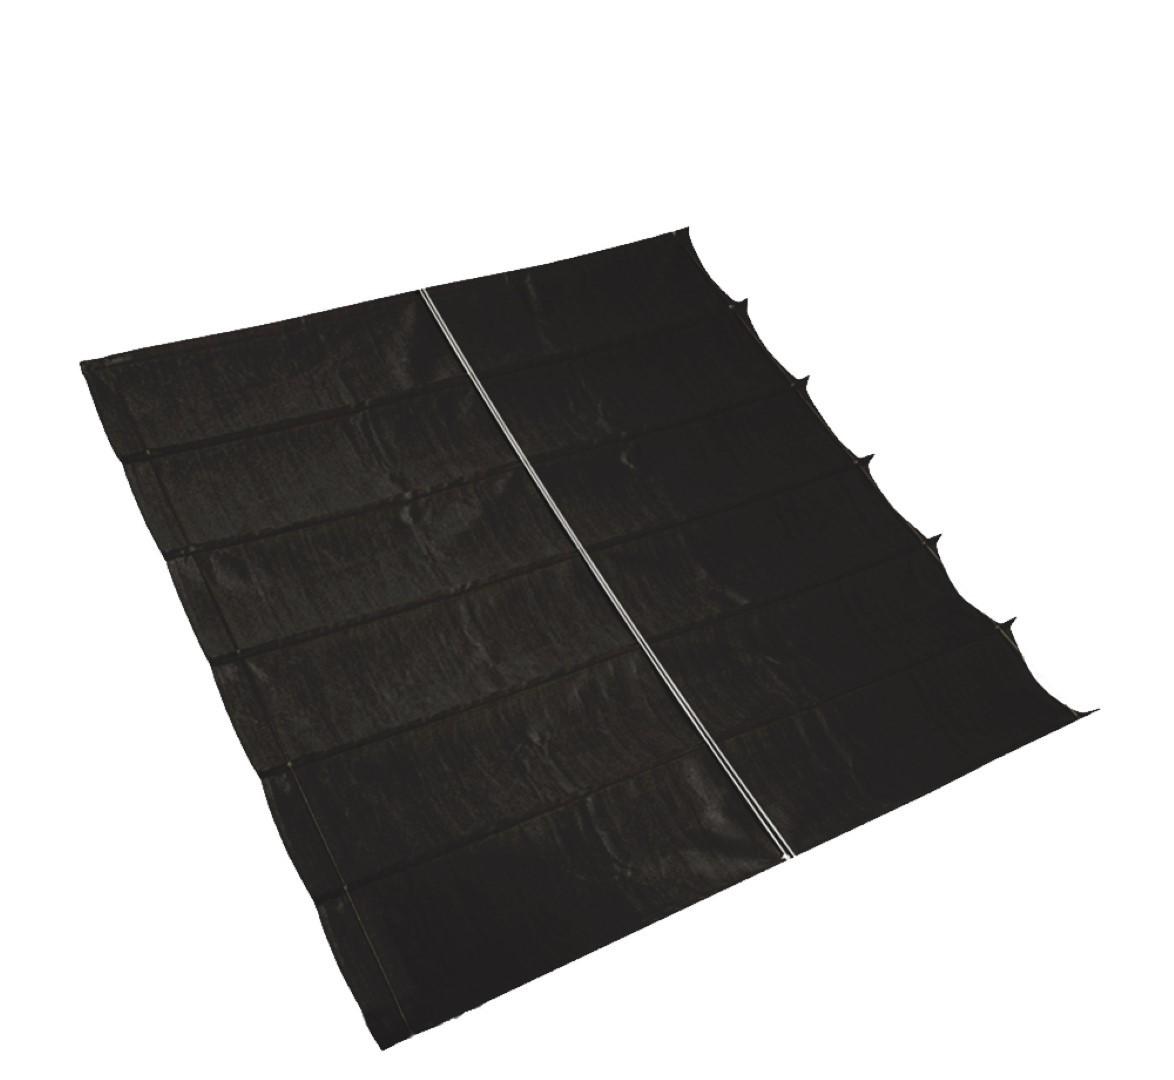 Harmonica schaduwdoek, B 2,9m L 5,0m, Zwart